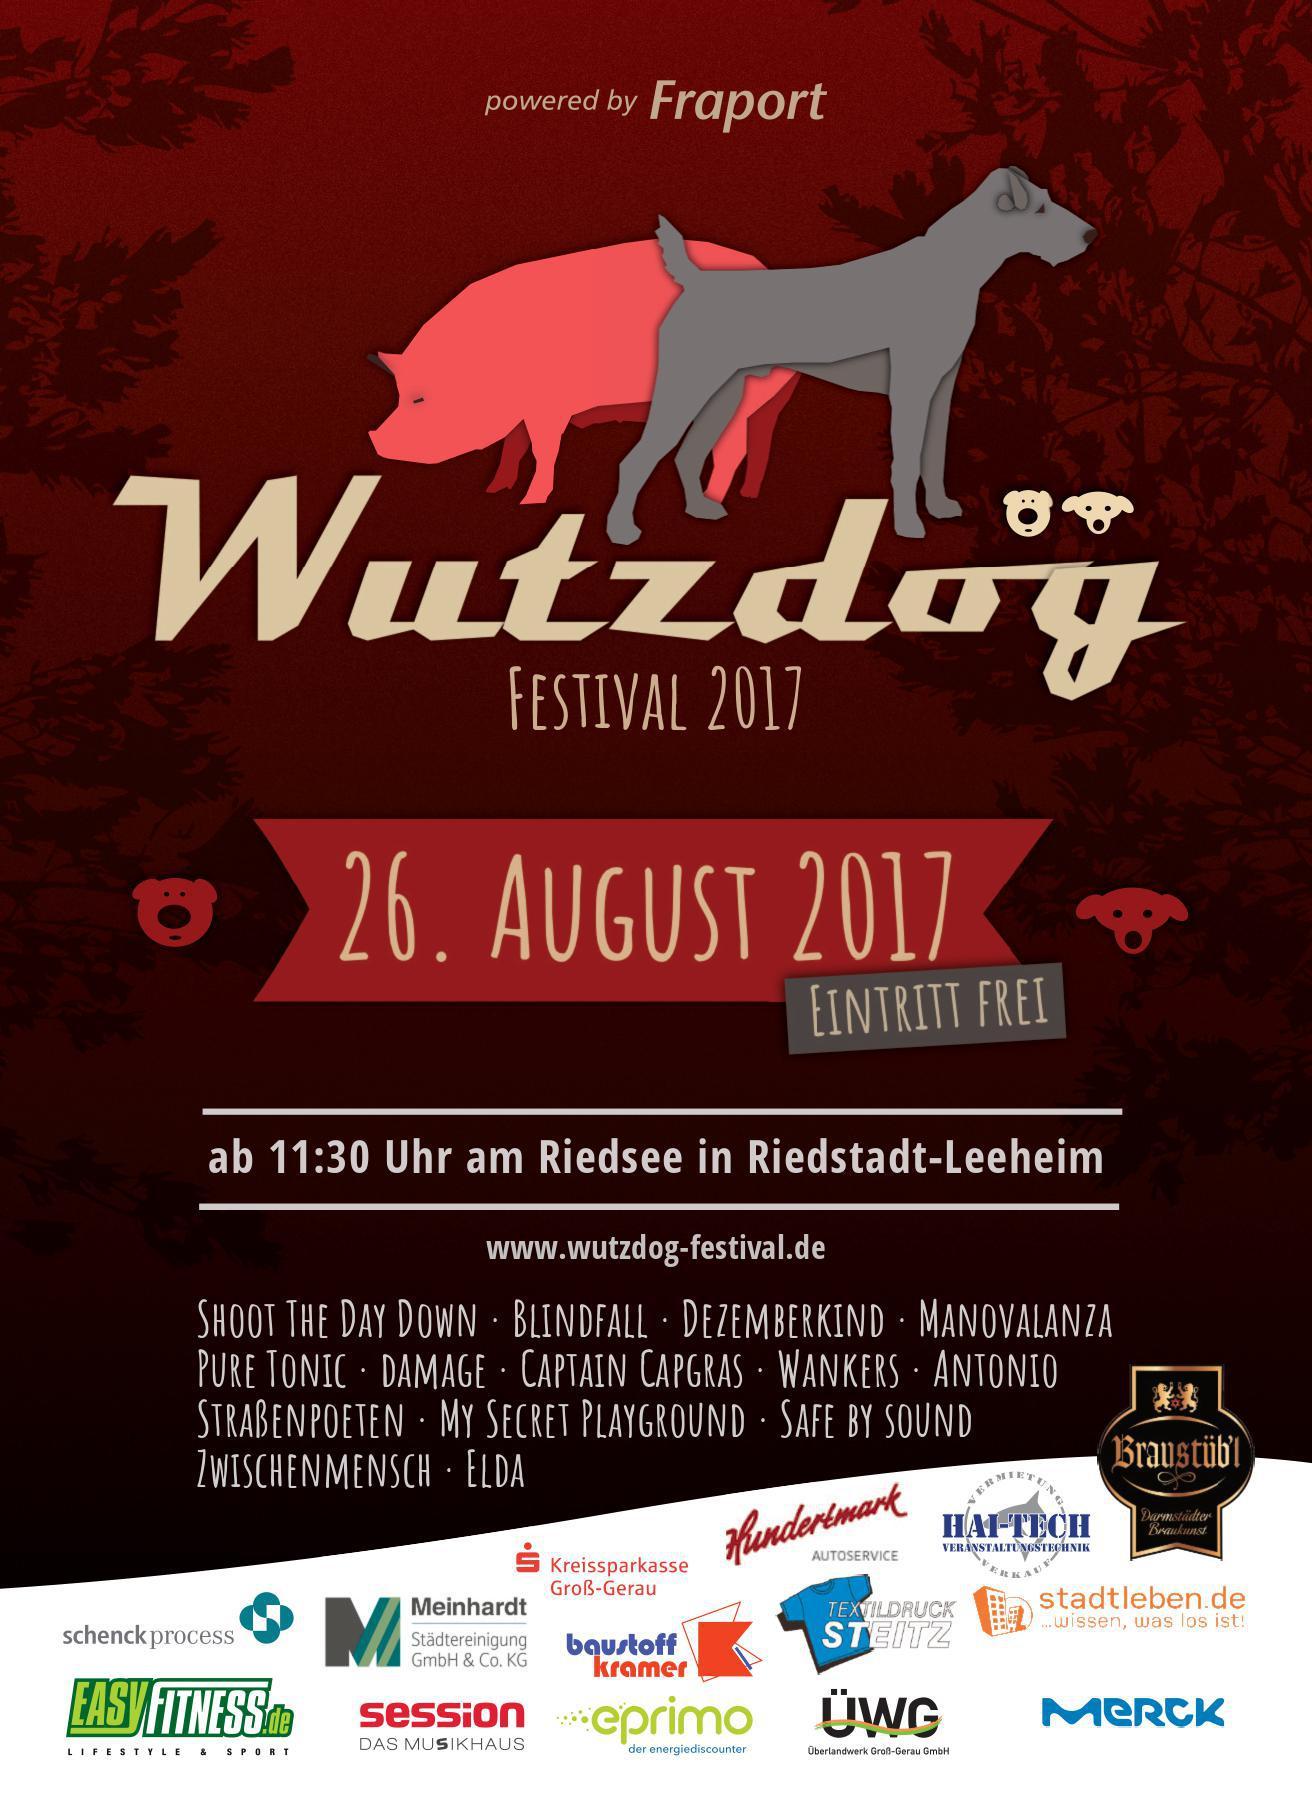 Wutzdog Festival in Leeheim am Riedsee 2017